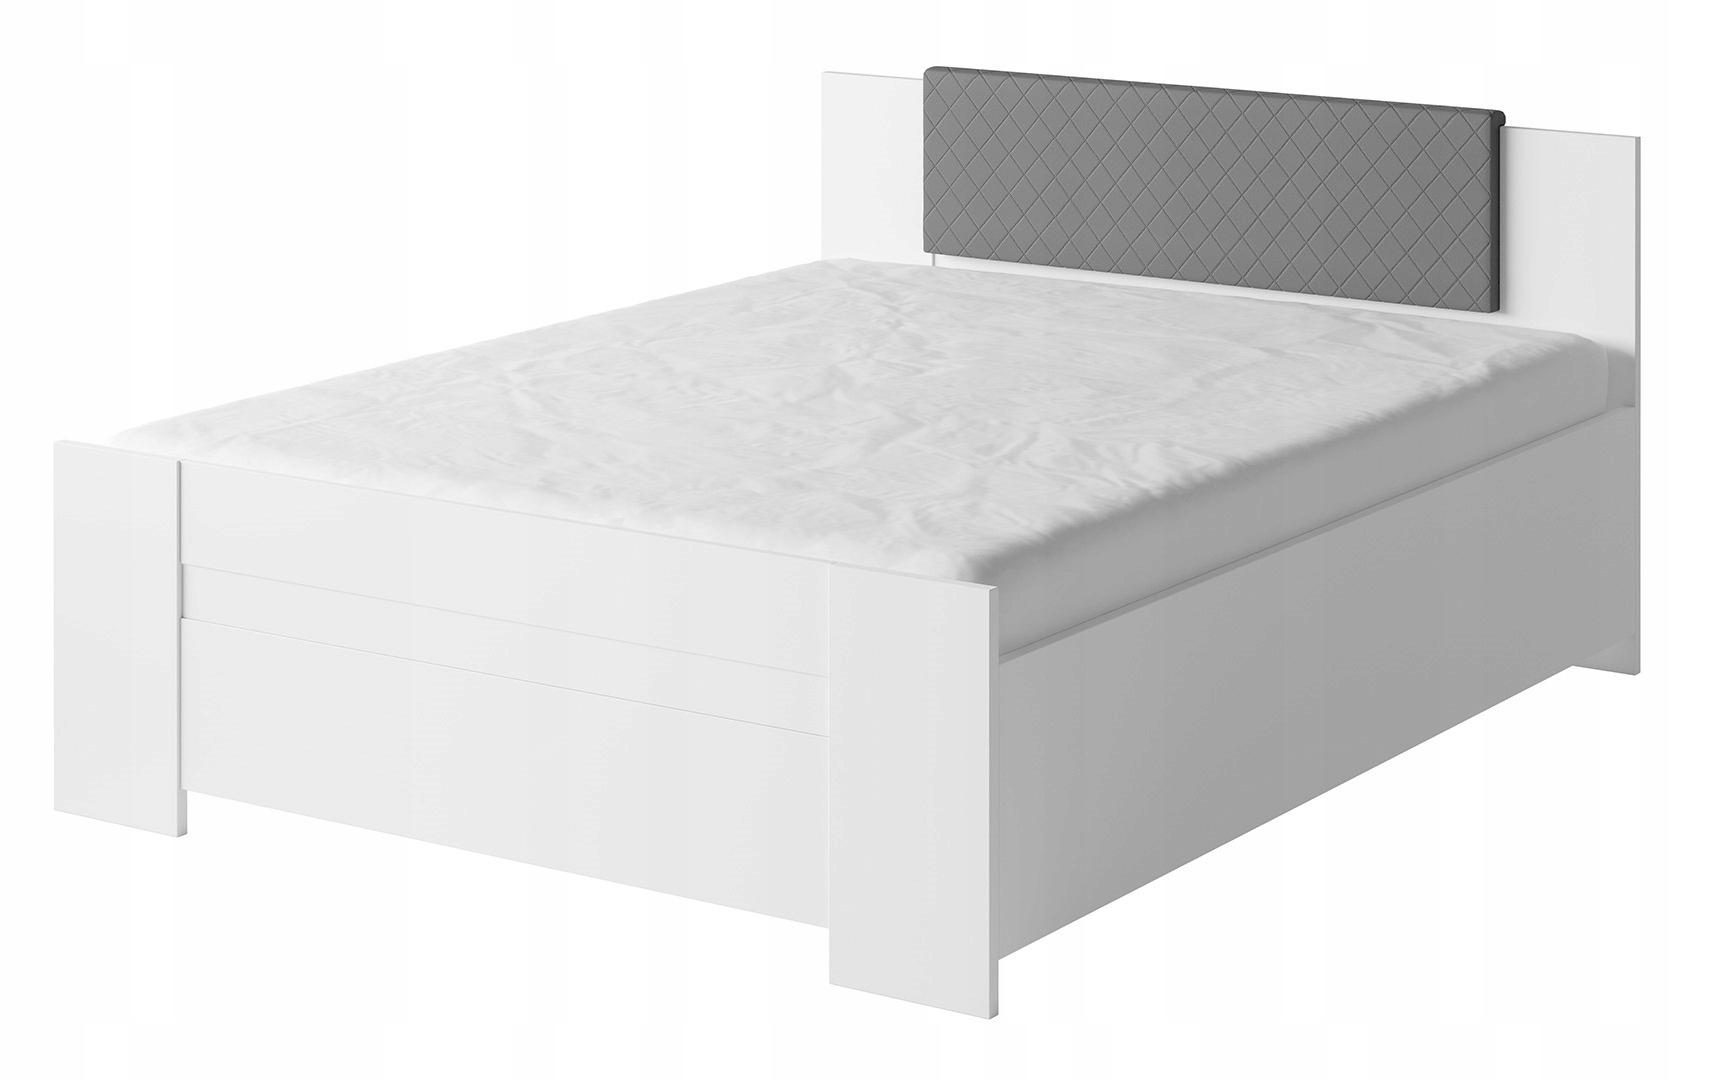 BONO posteľ 160x200 s postele a matrace bonell